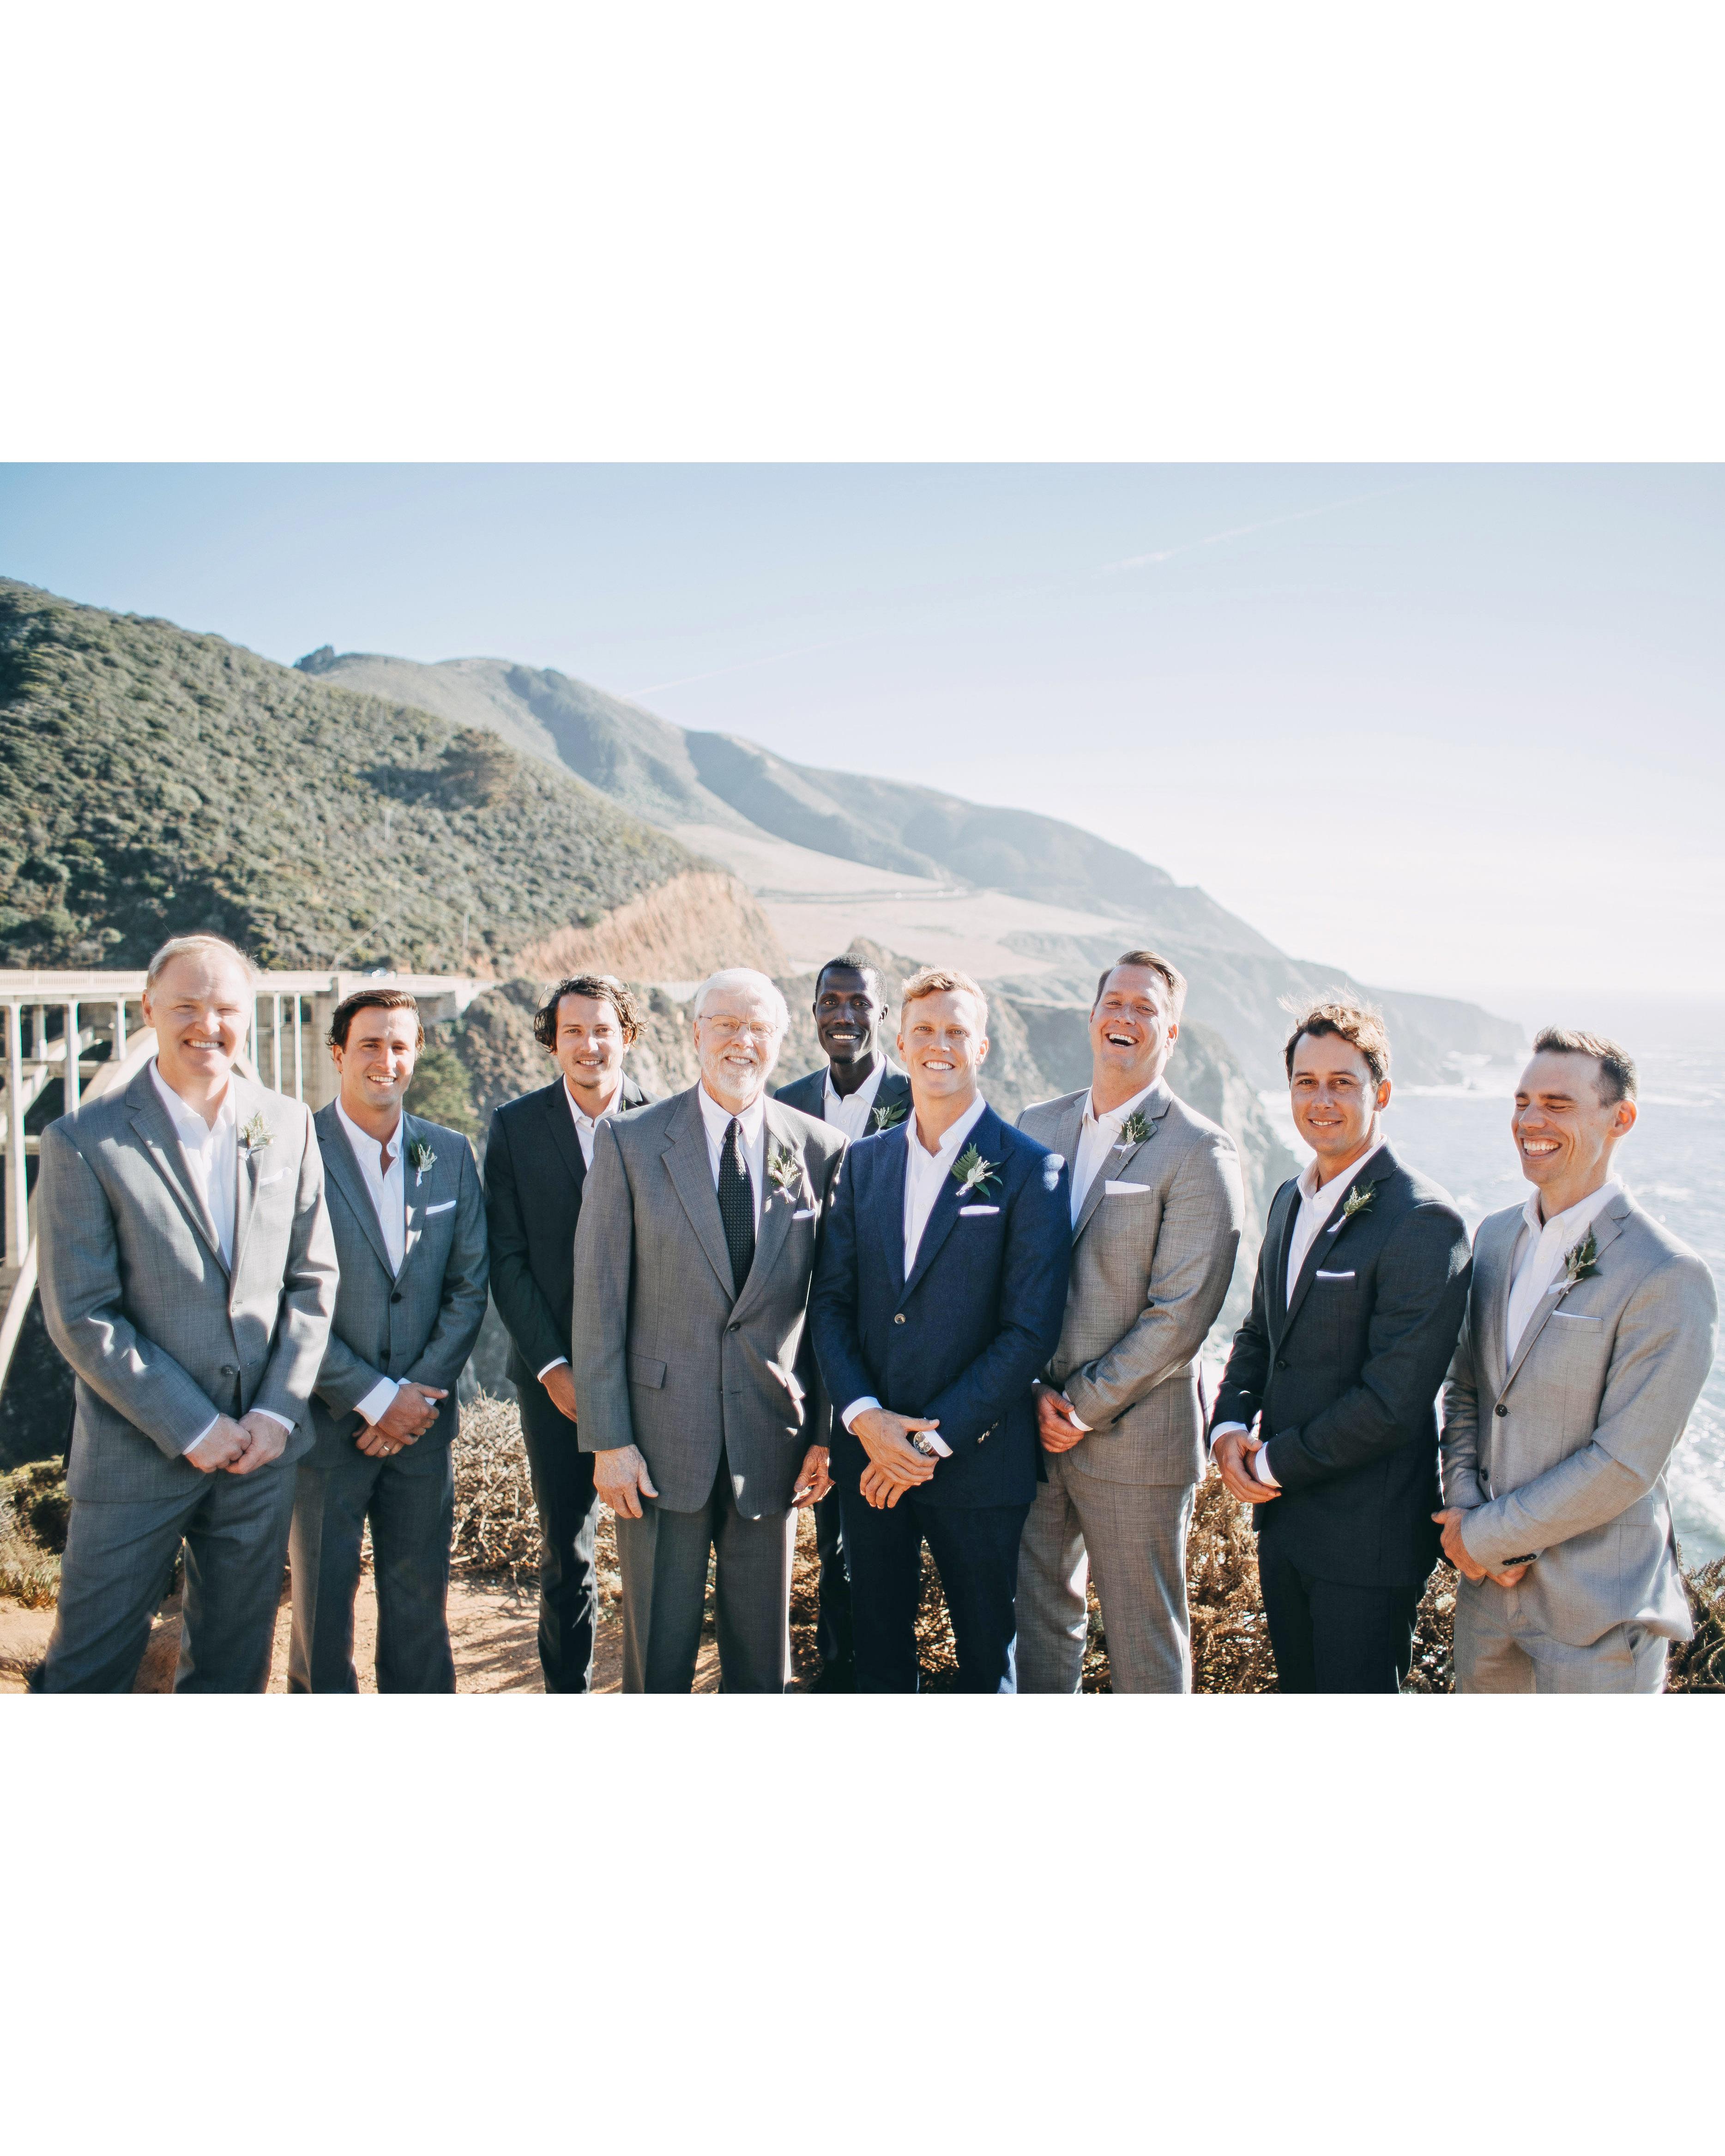 danielle adam wedding groom groomsmen